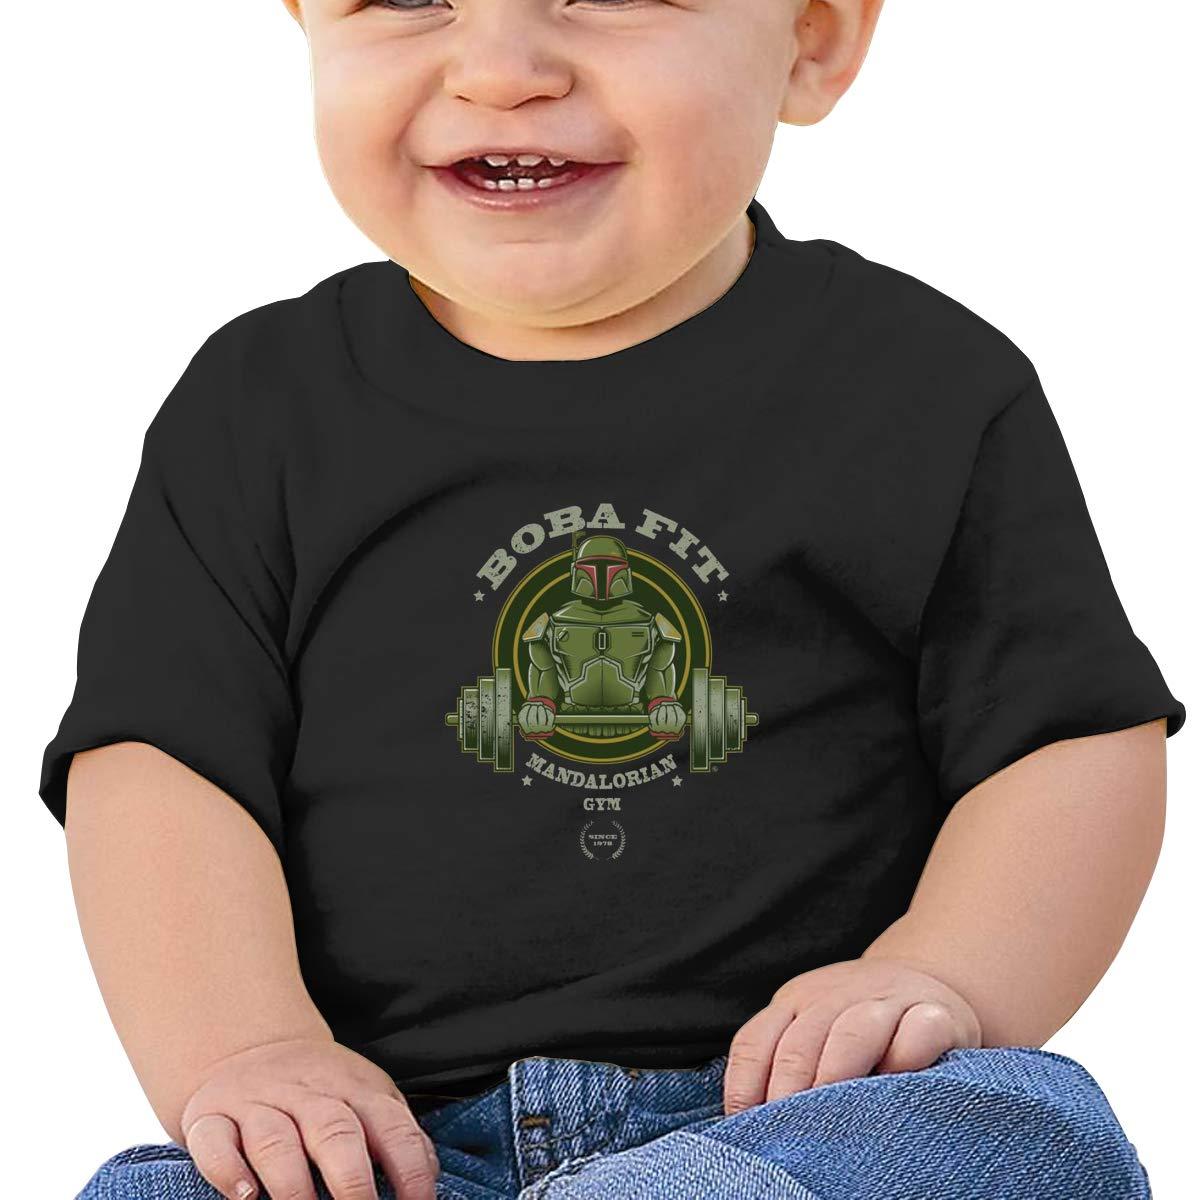 Boba FIT Toddler Short-Sleeve Tee for Boy Girl Infant Kids T-Shirt On Newborn 6-18 Months